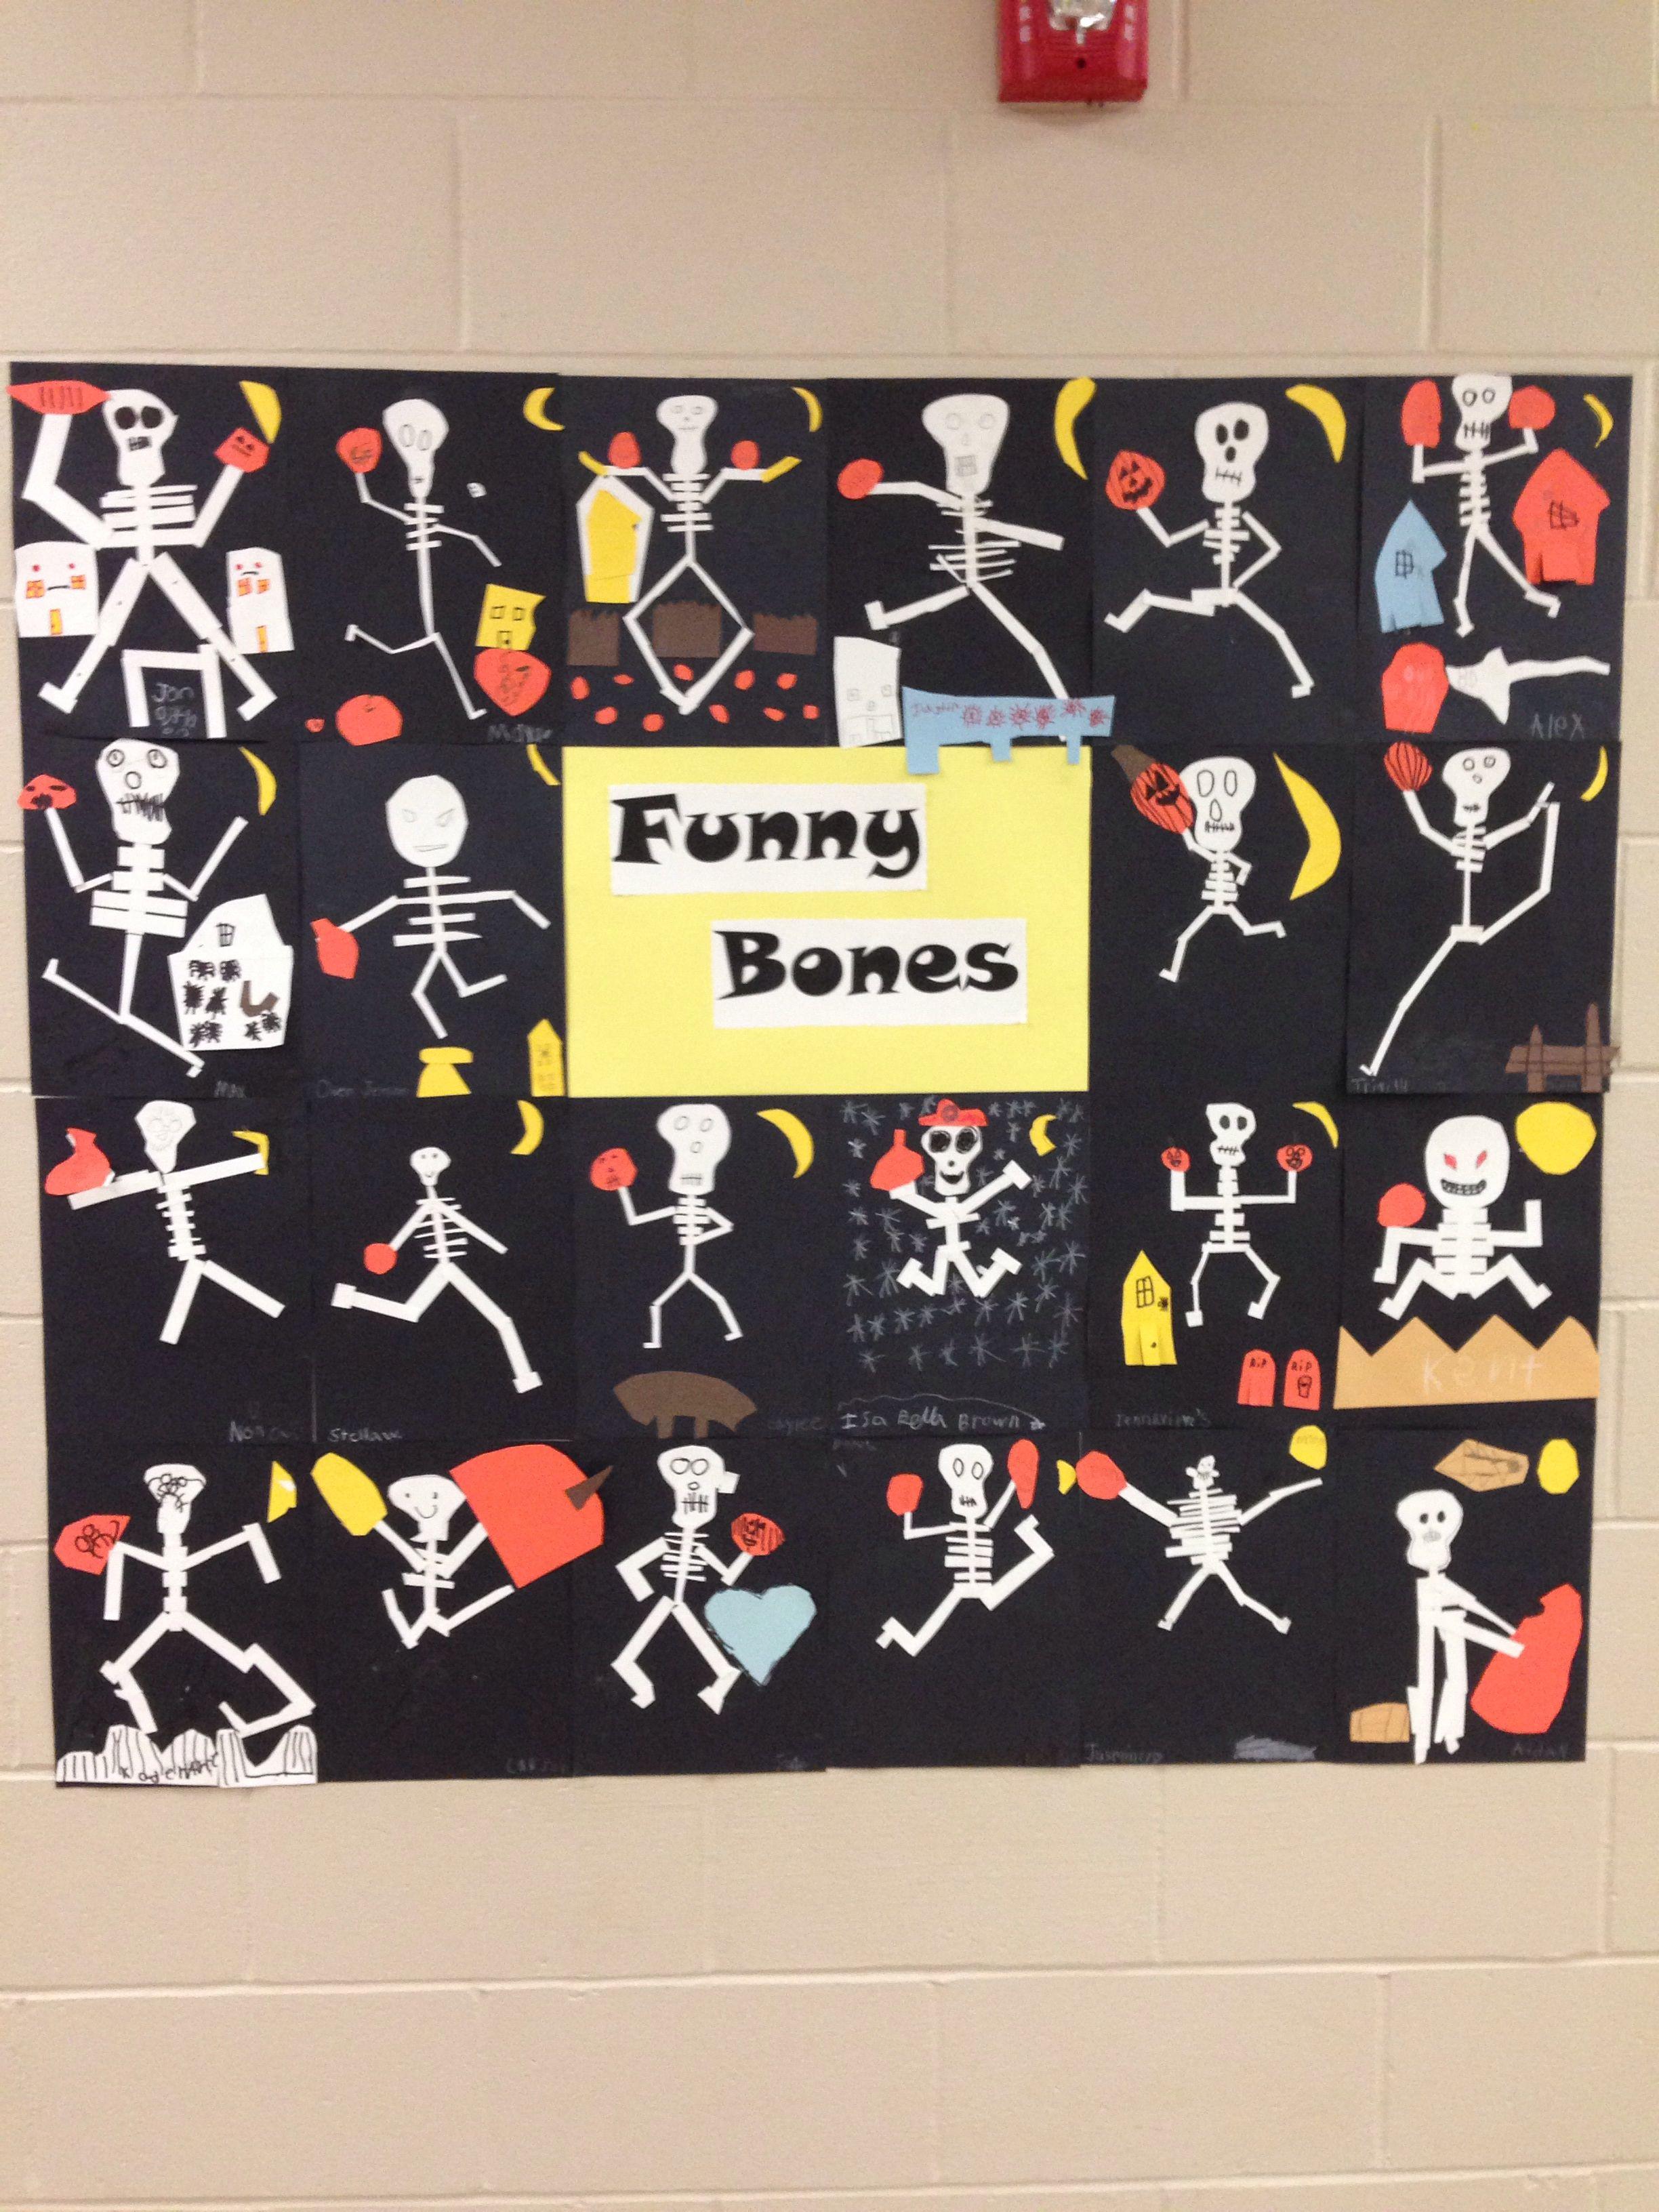 Halloween Bulletin Board Funny Bones I Love How Each